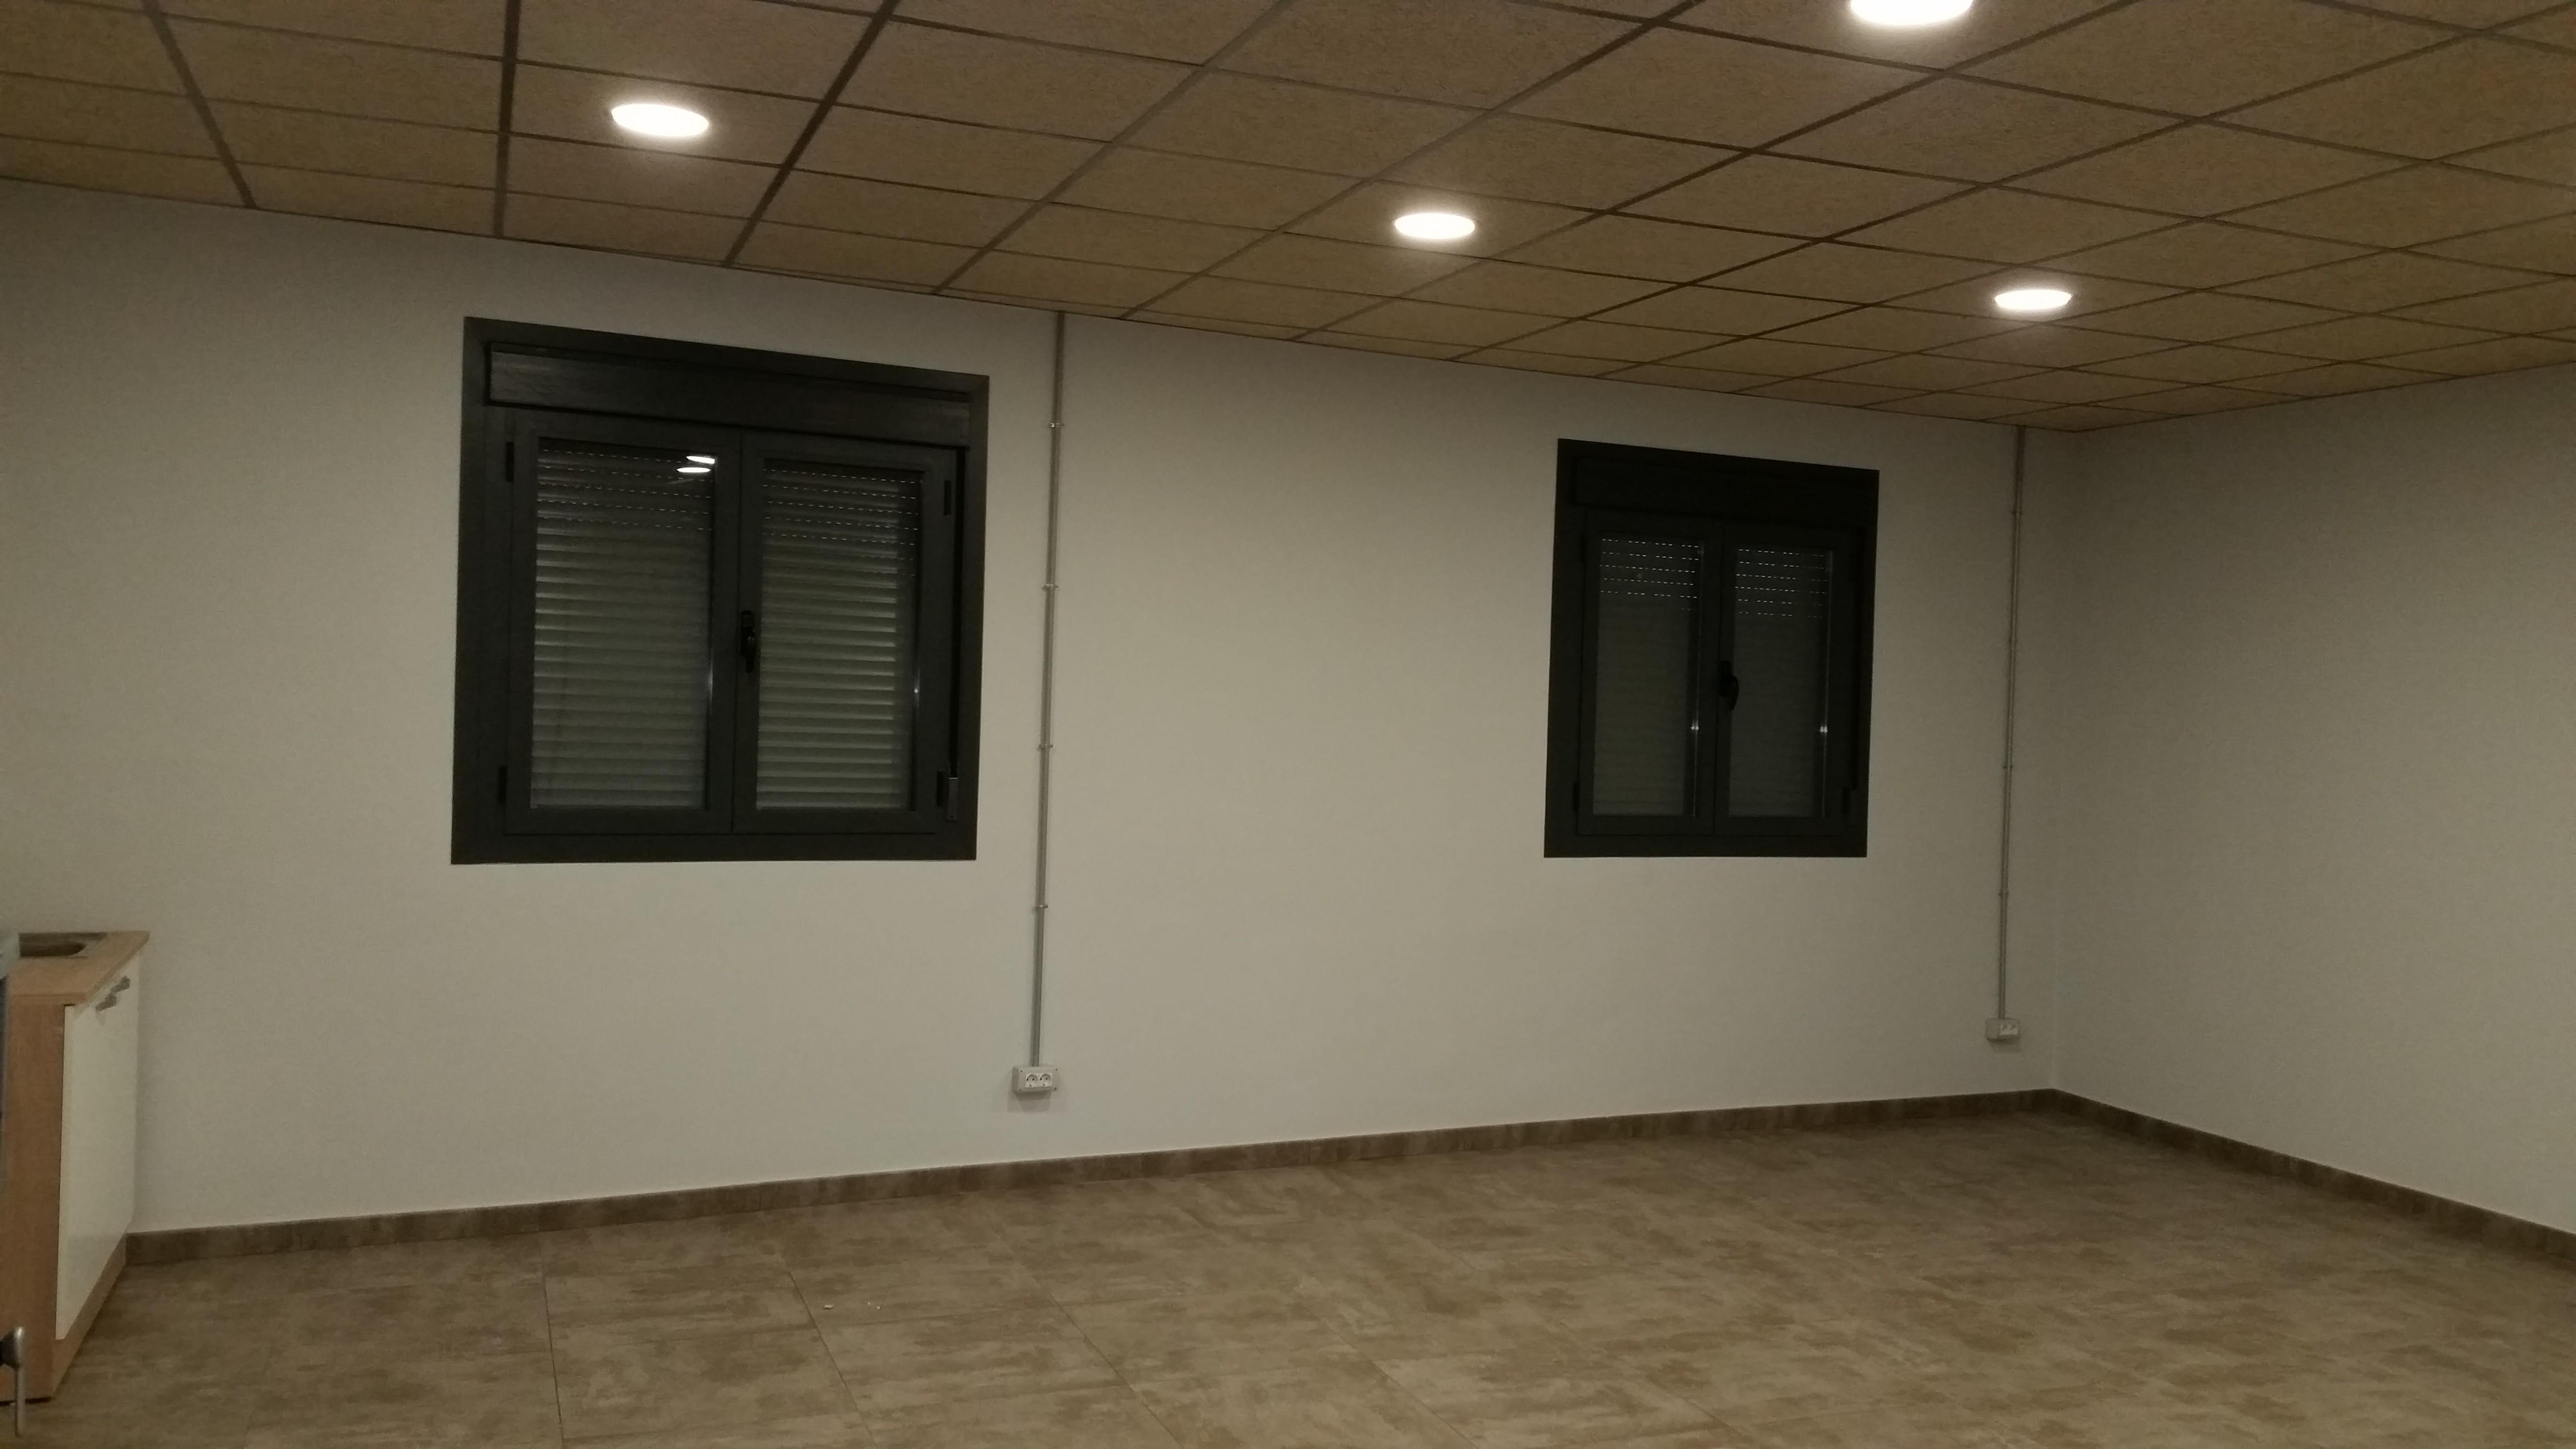 Reformas ba os cocinas pisos locales zaragoza - Reformas pisos zaragoza ...